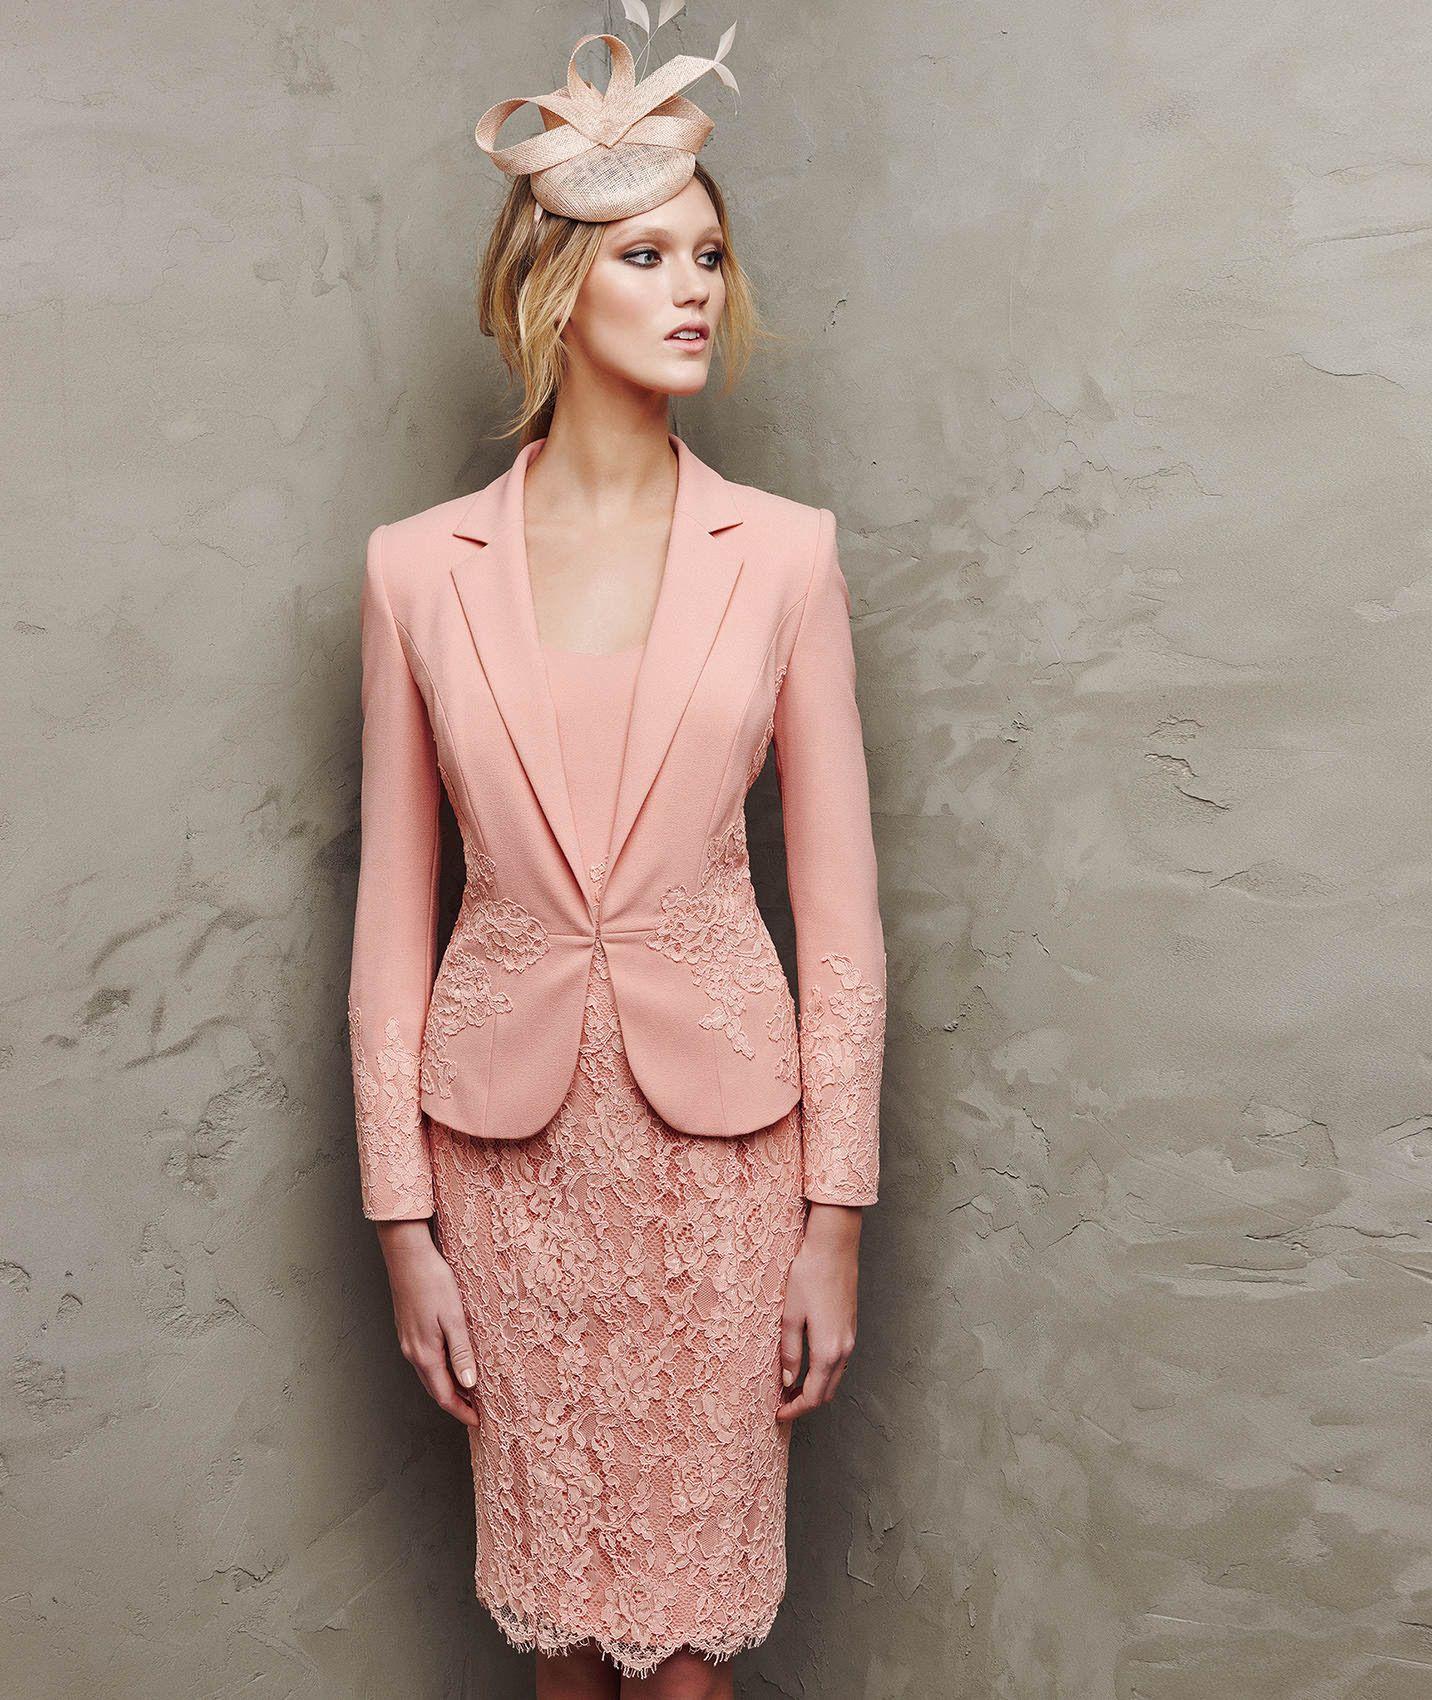 Vestido de crepe y encaje de fiesta | novias | Pinterest | Encaje ...